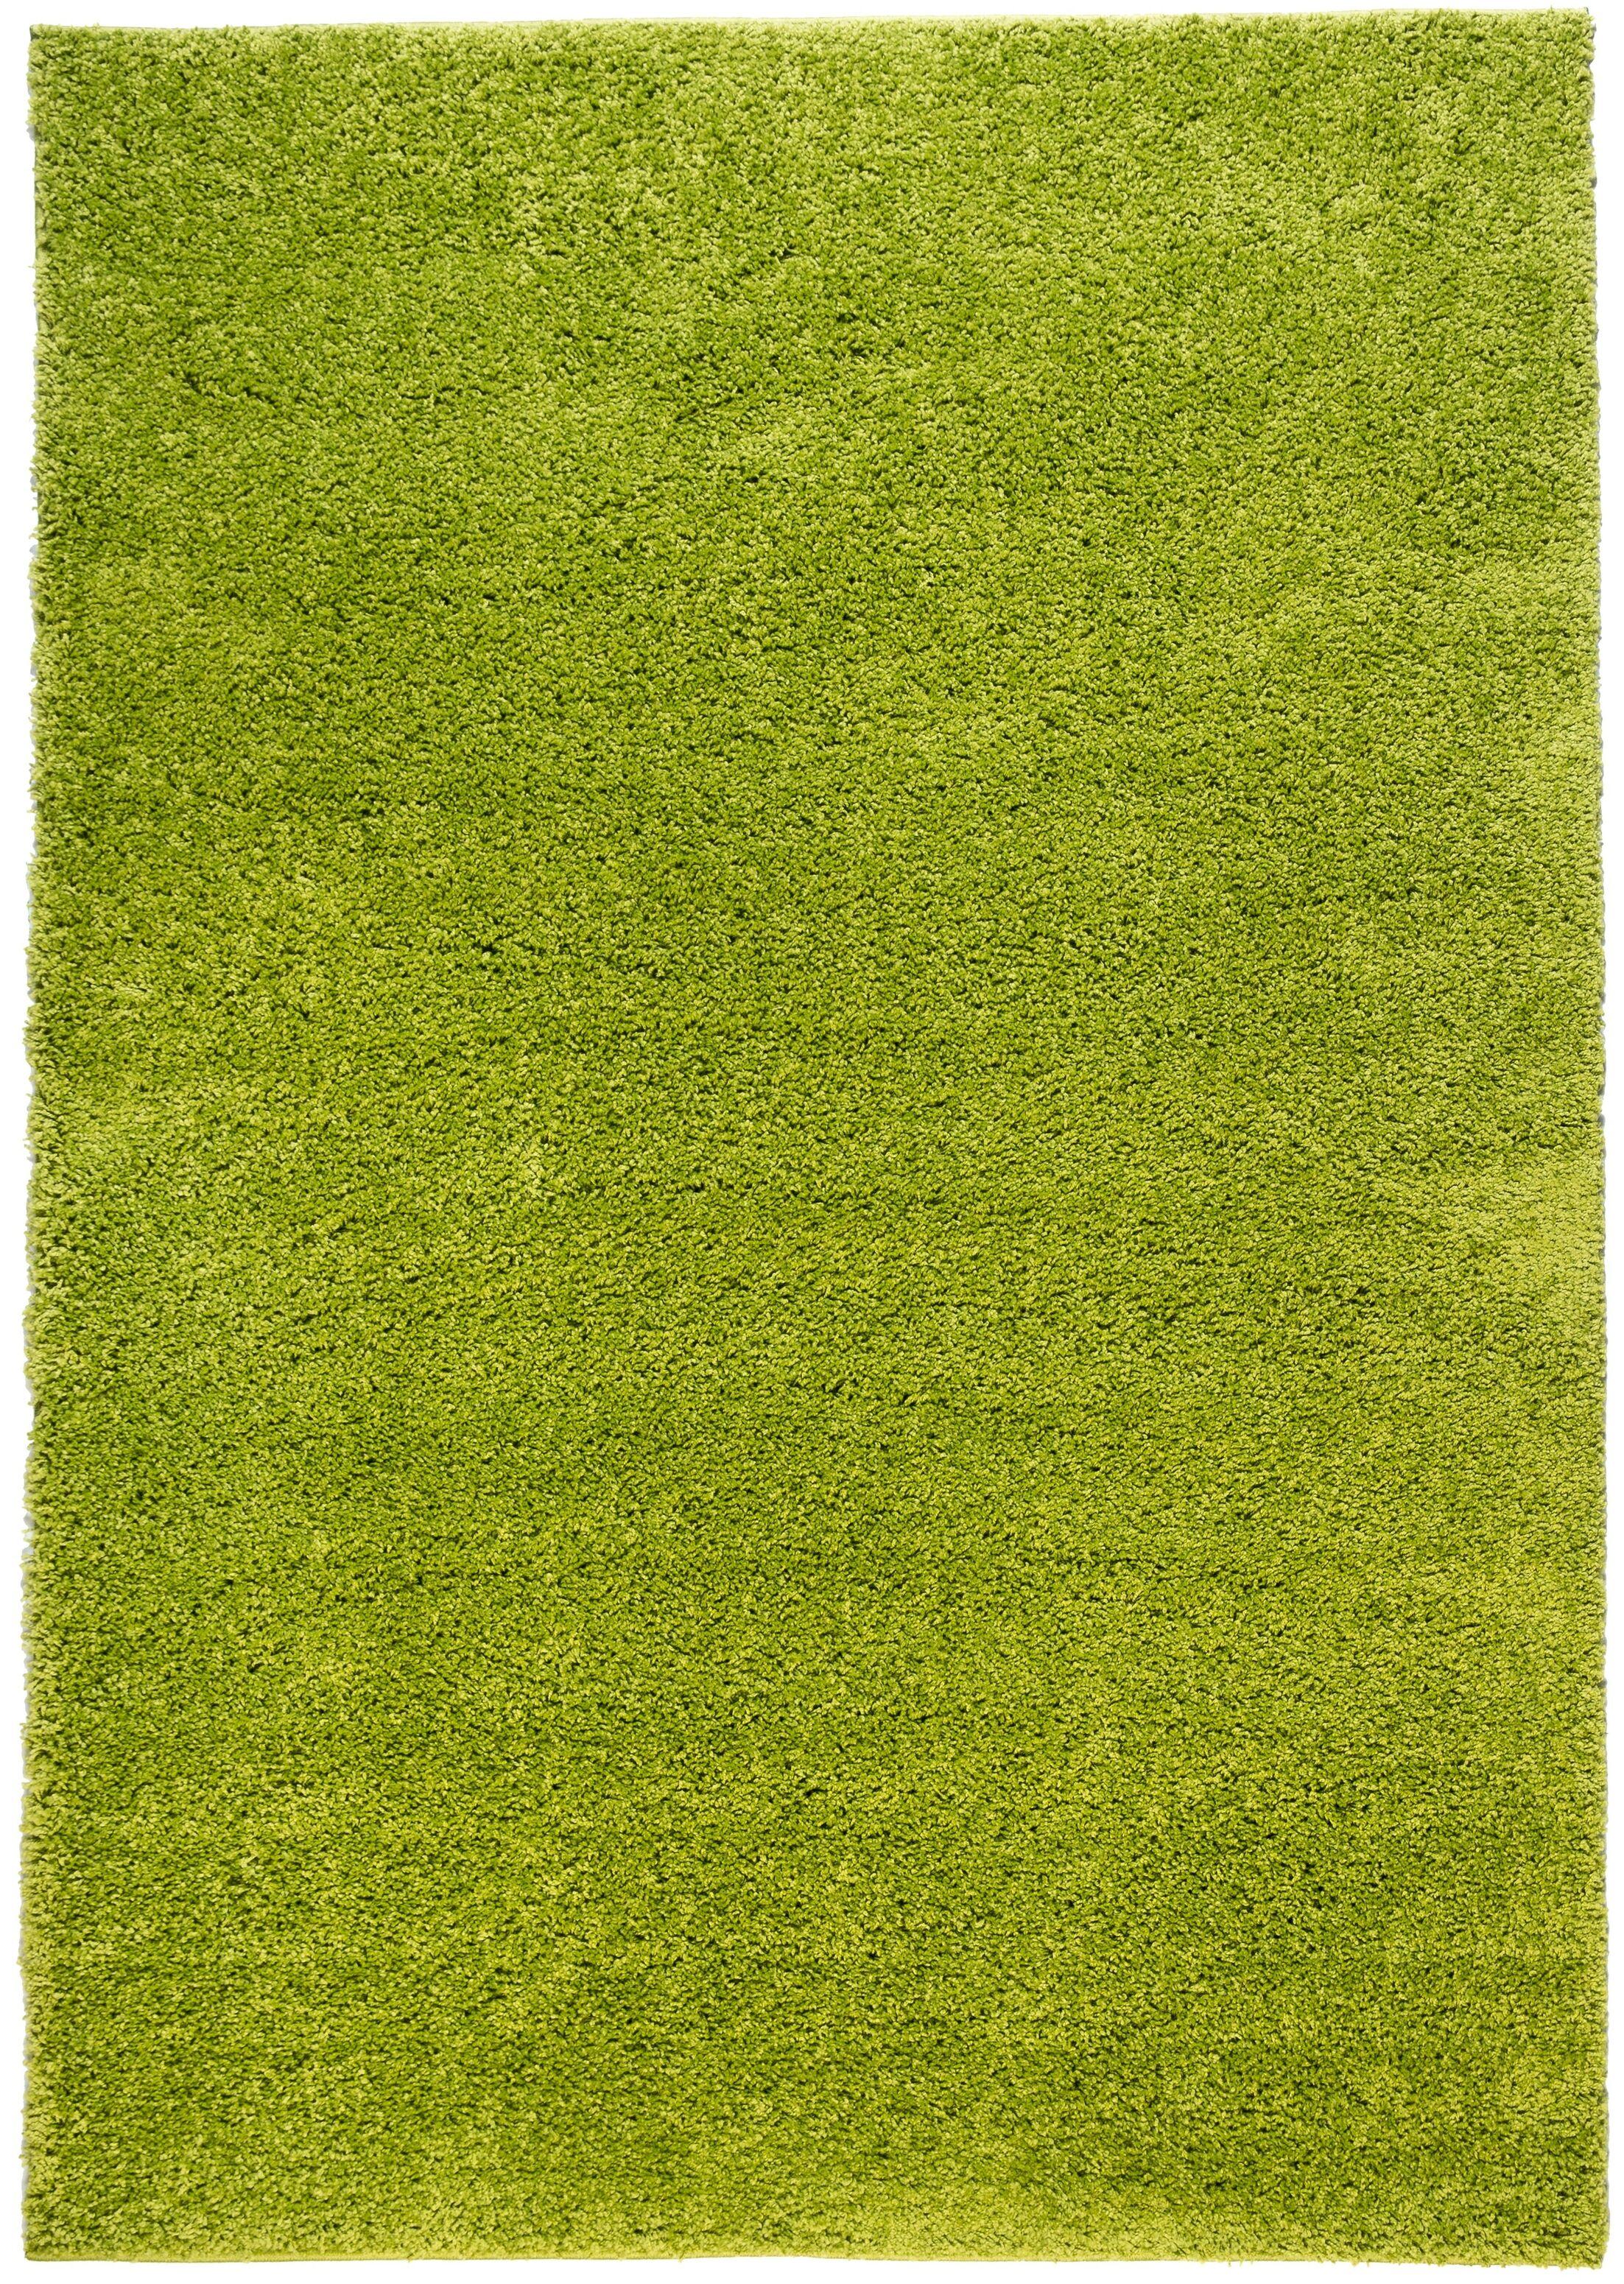 Reynolds Plain Solid Green Area Rug Rug Size: 5' x 7'2